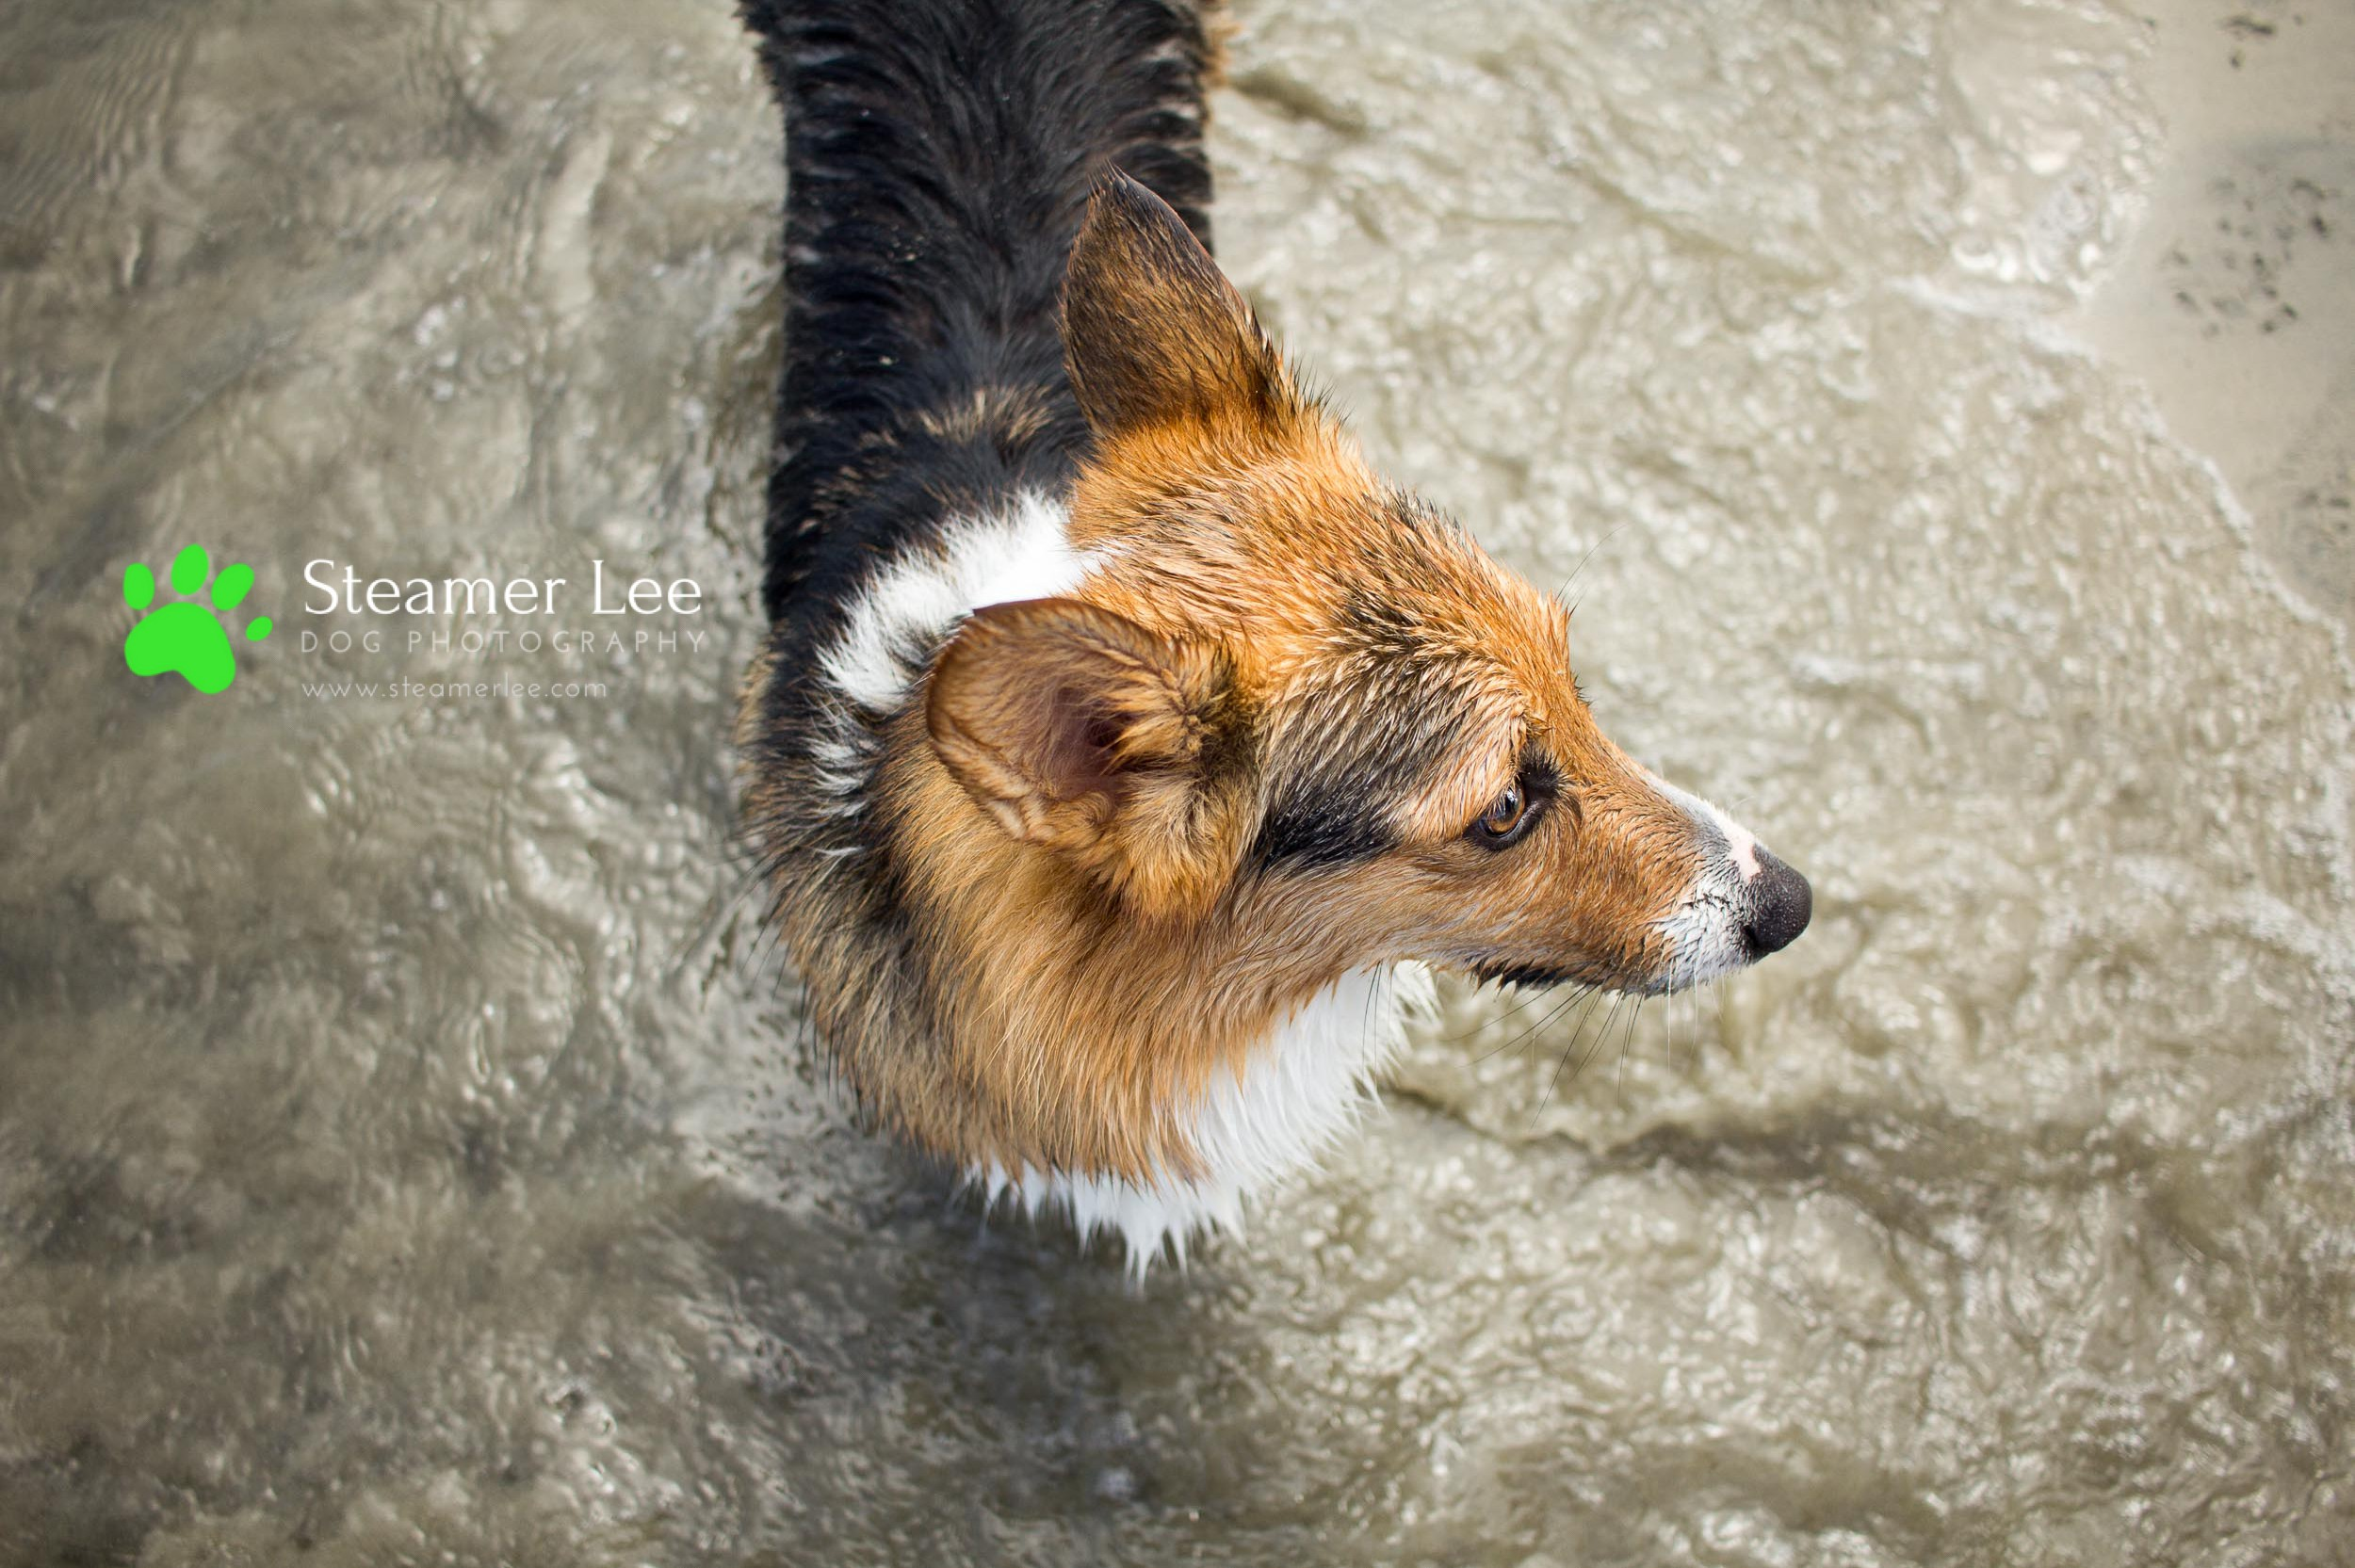 Steamer Lee Dog Photography - July 2017 So Cal Corgi Beach Day - Vol. 3 - 18.jpg